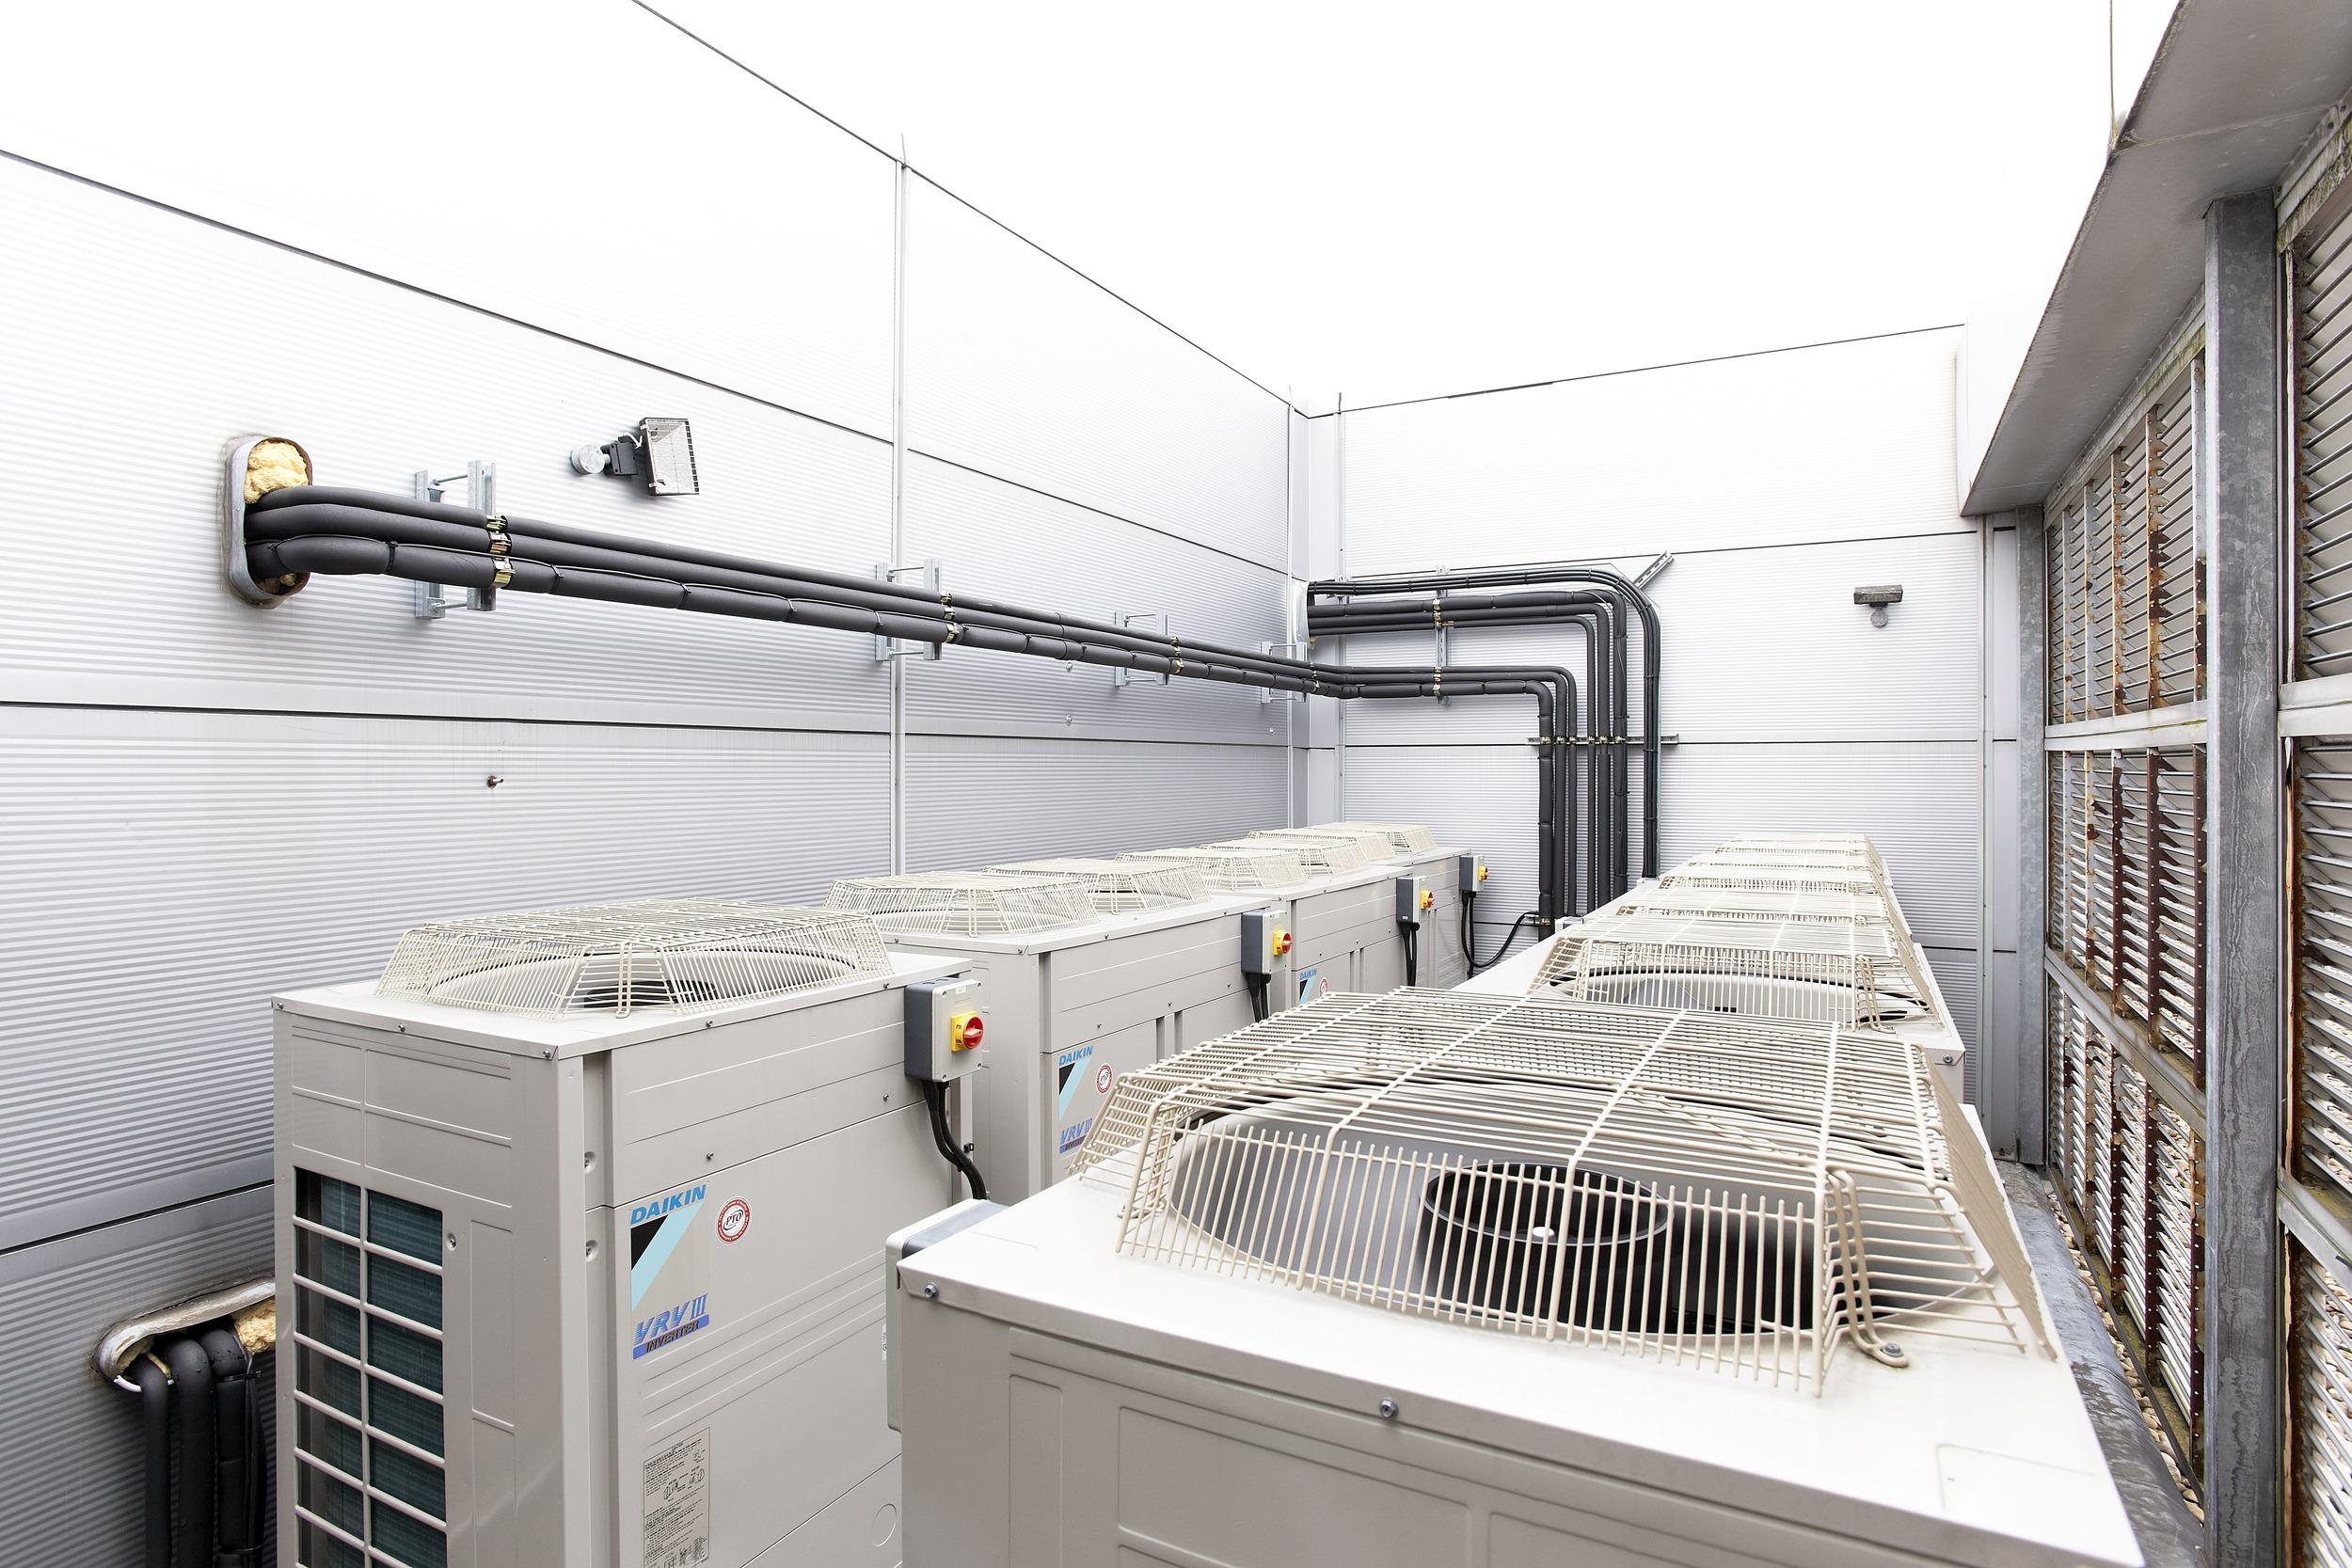 Anritsu-361-Degrees-Air-Conditioning-Case-Study-10.jpg